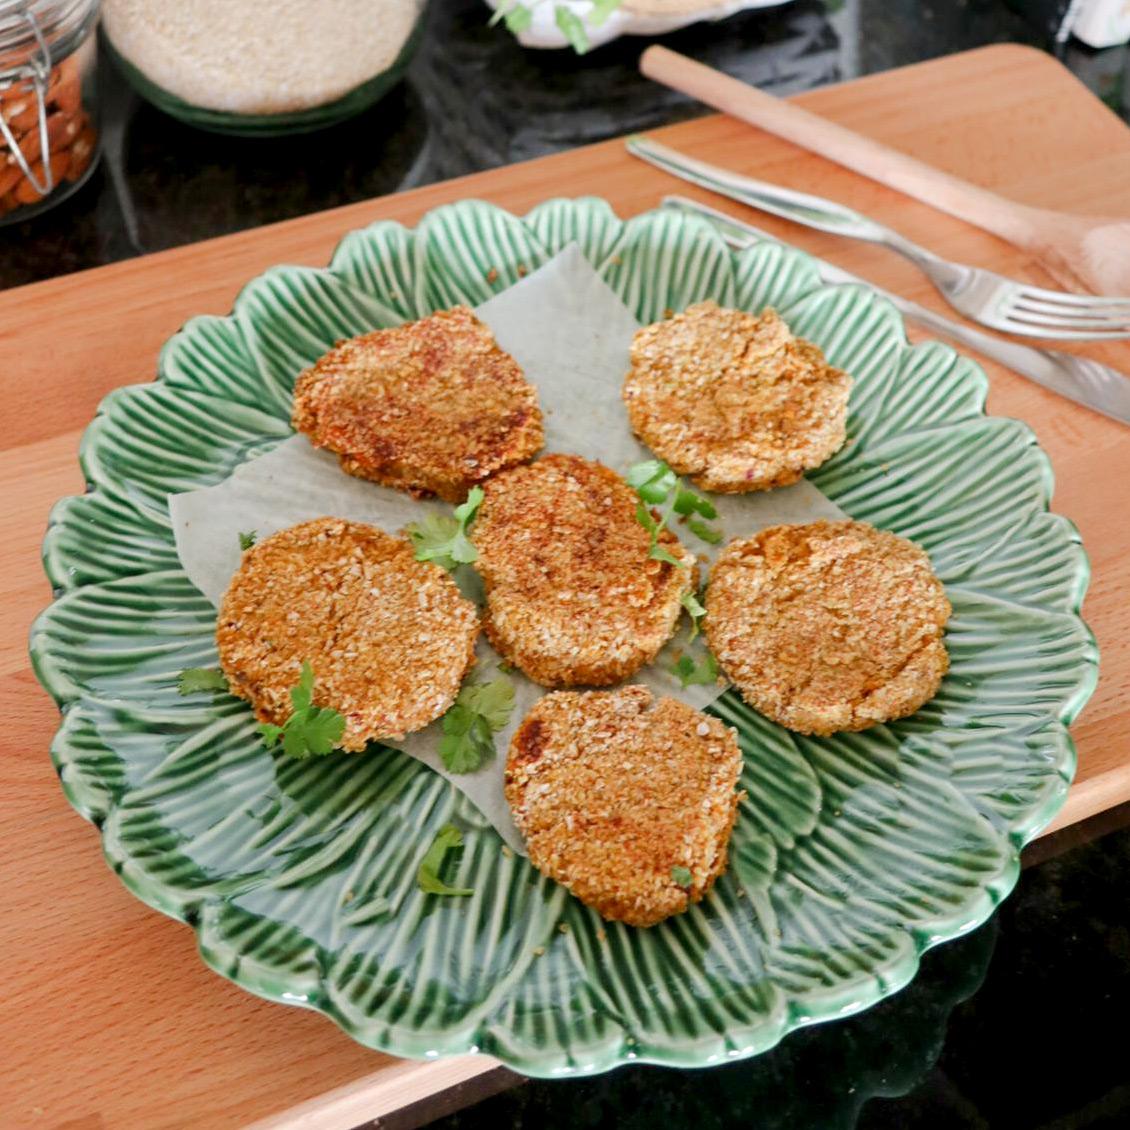 Almond and Sweet Potato Patties